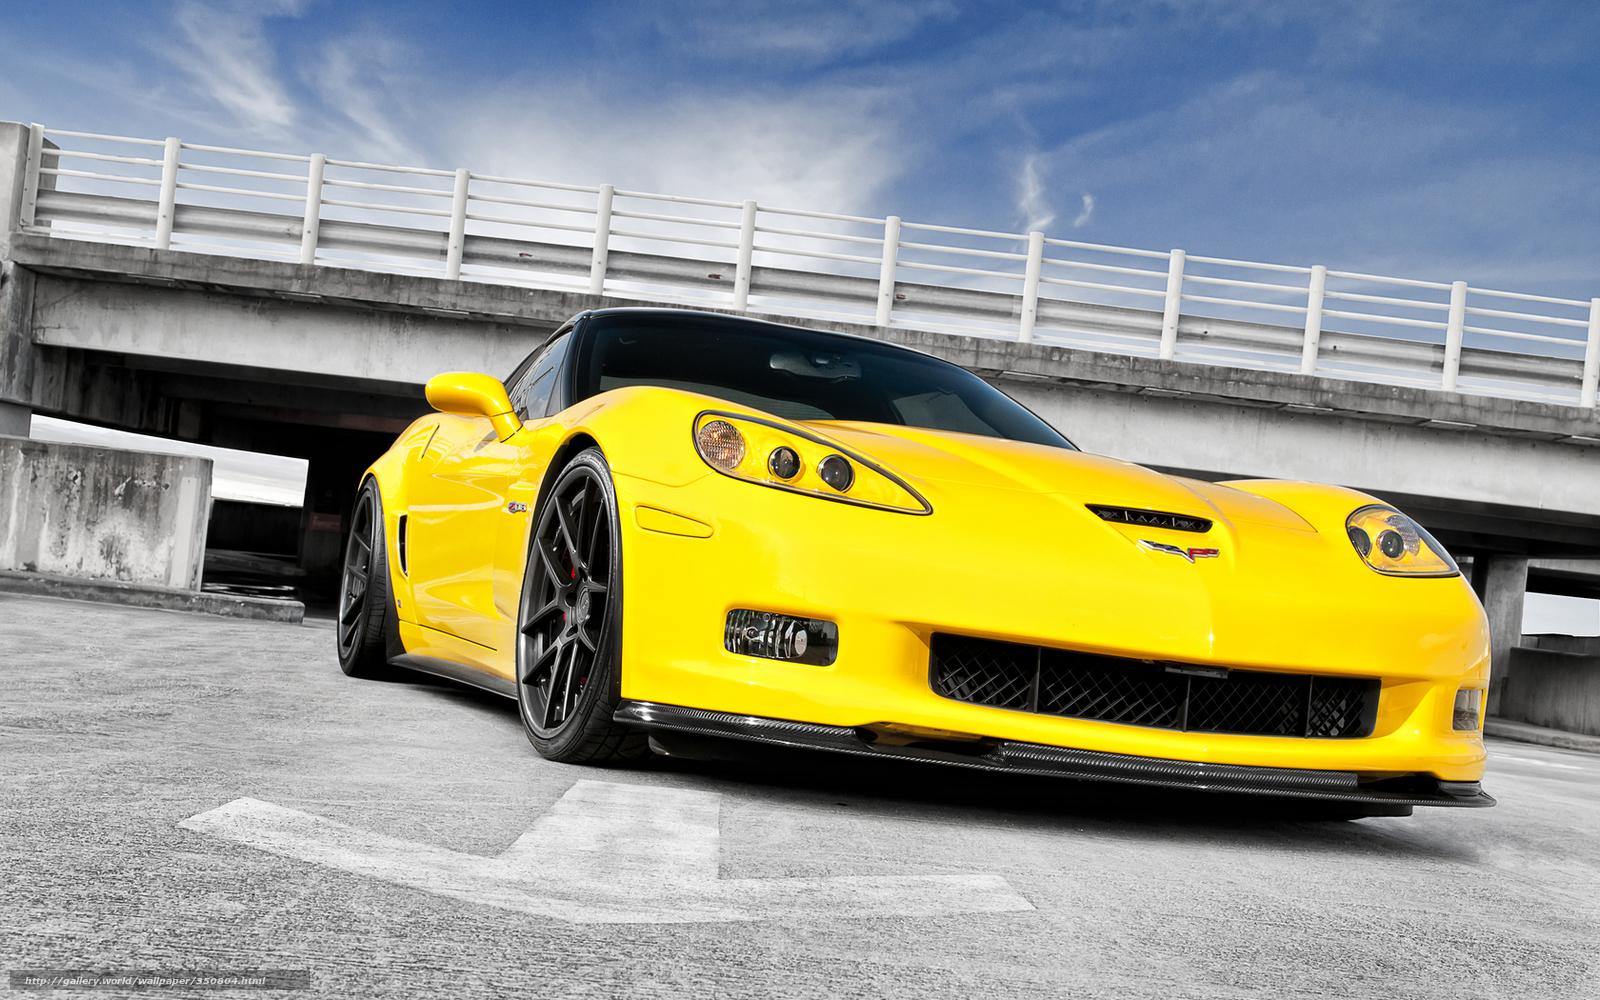 Download wallpaper Chevrolet corvette yellow front end desktop 1600x1000